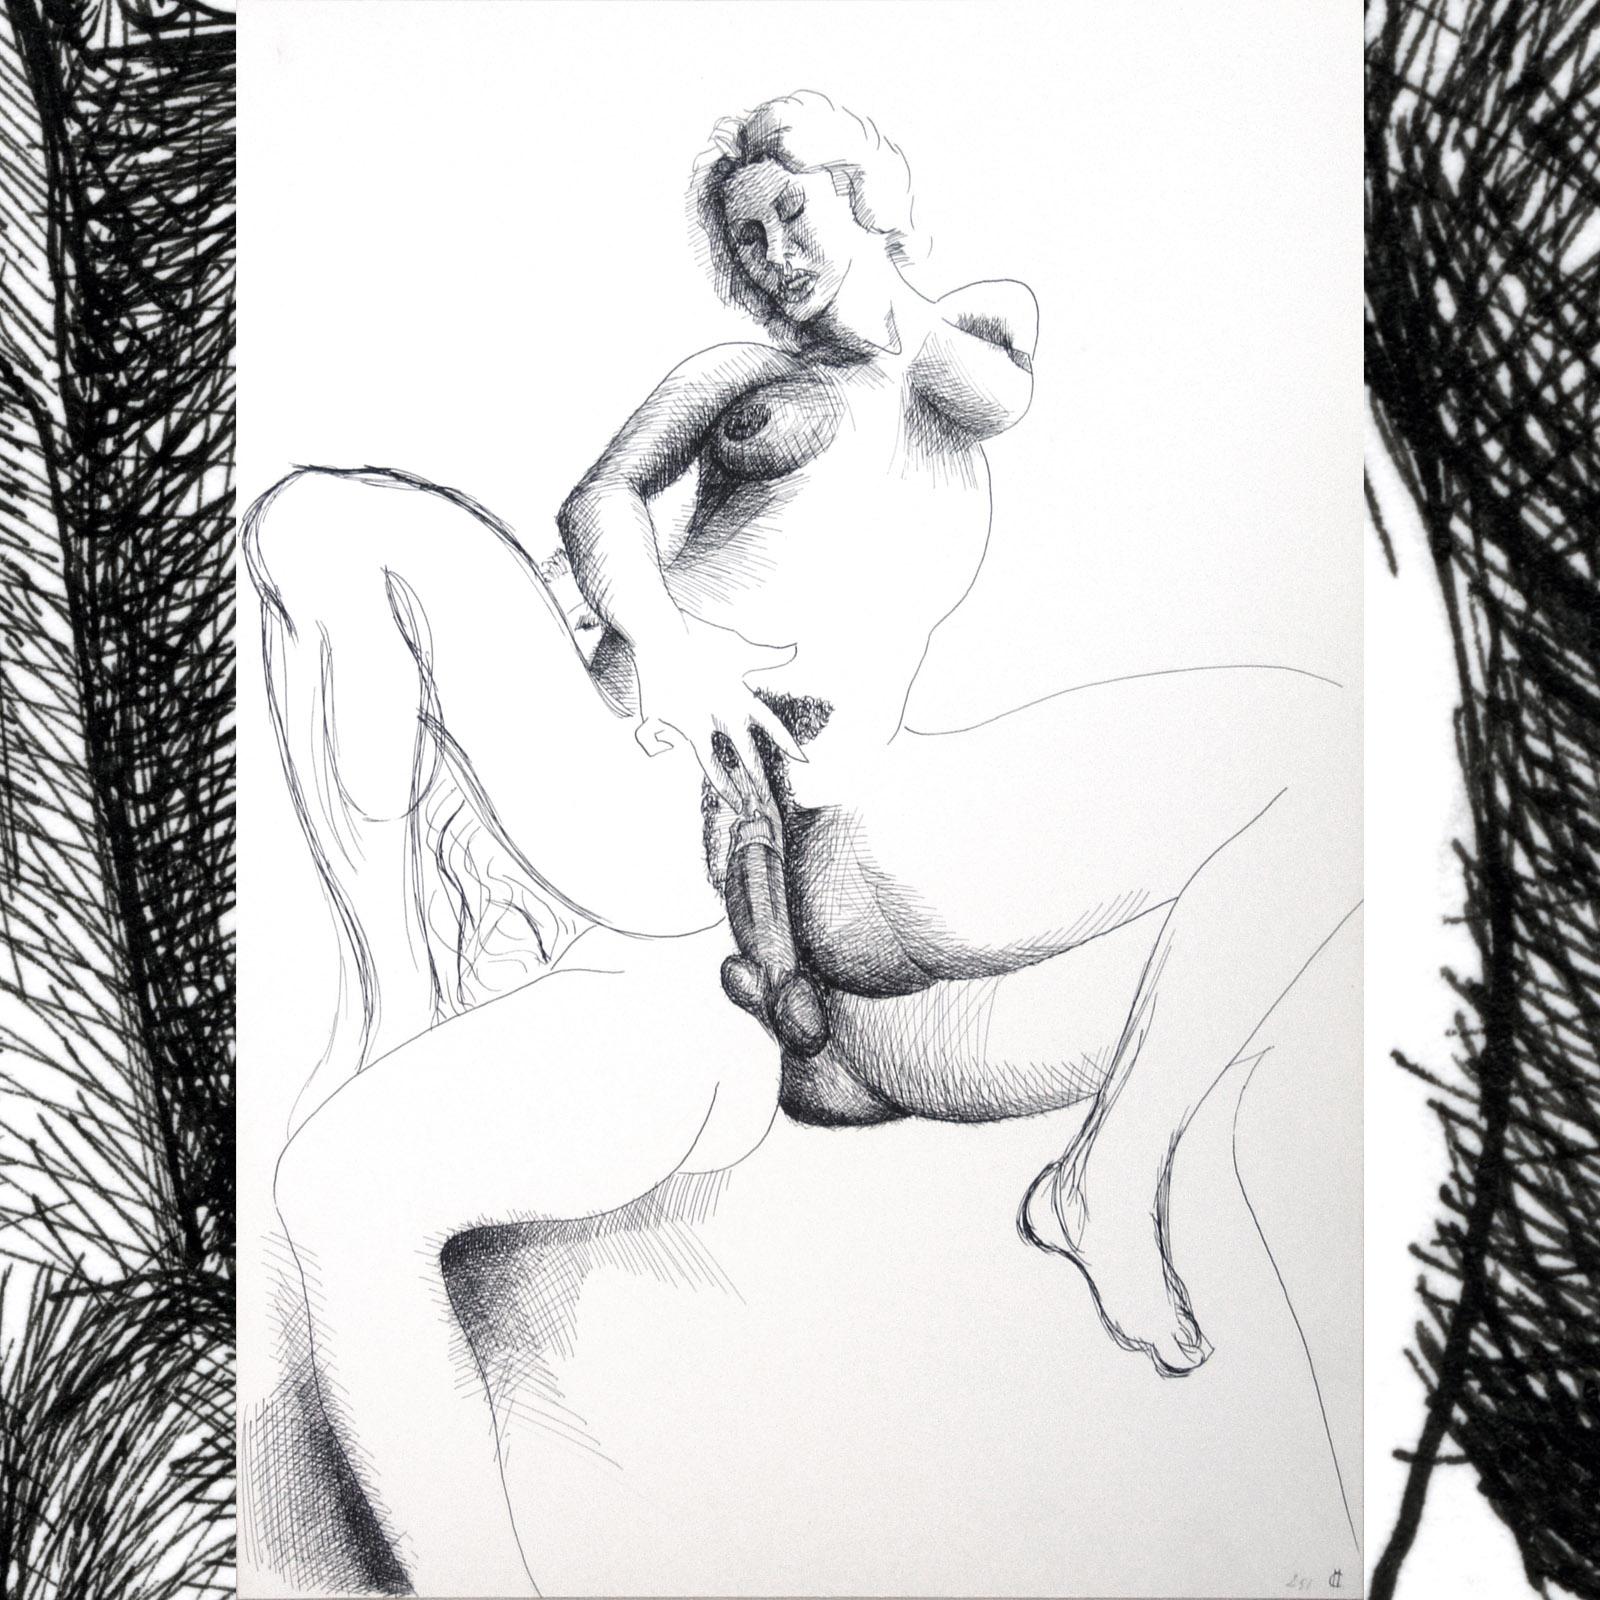 BD rotique et porno, dessins sexy sur Voissa